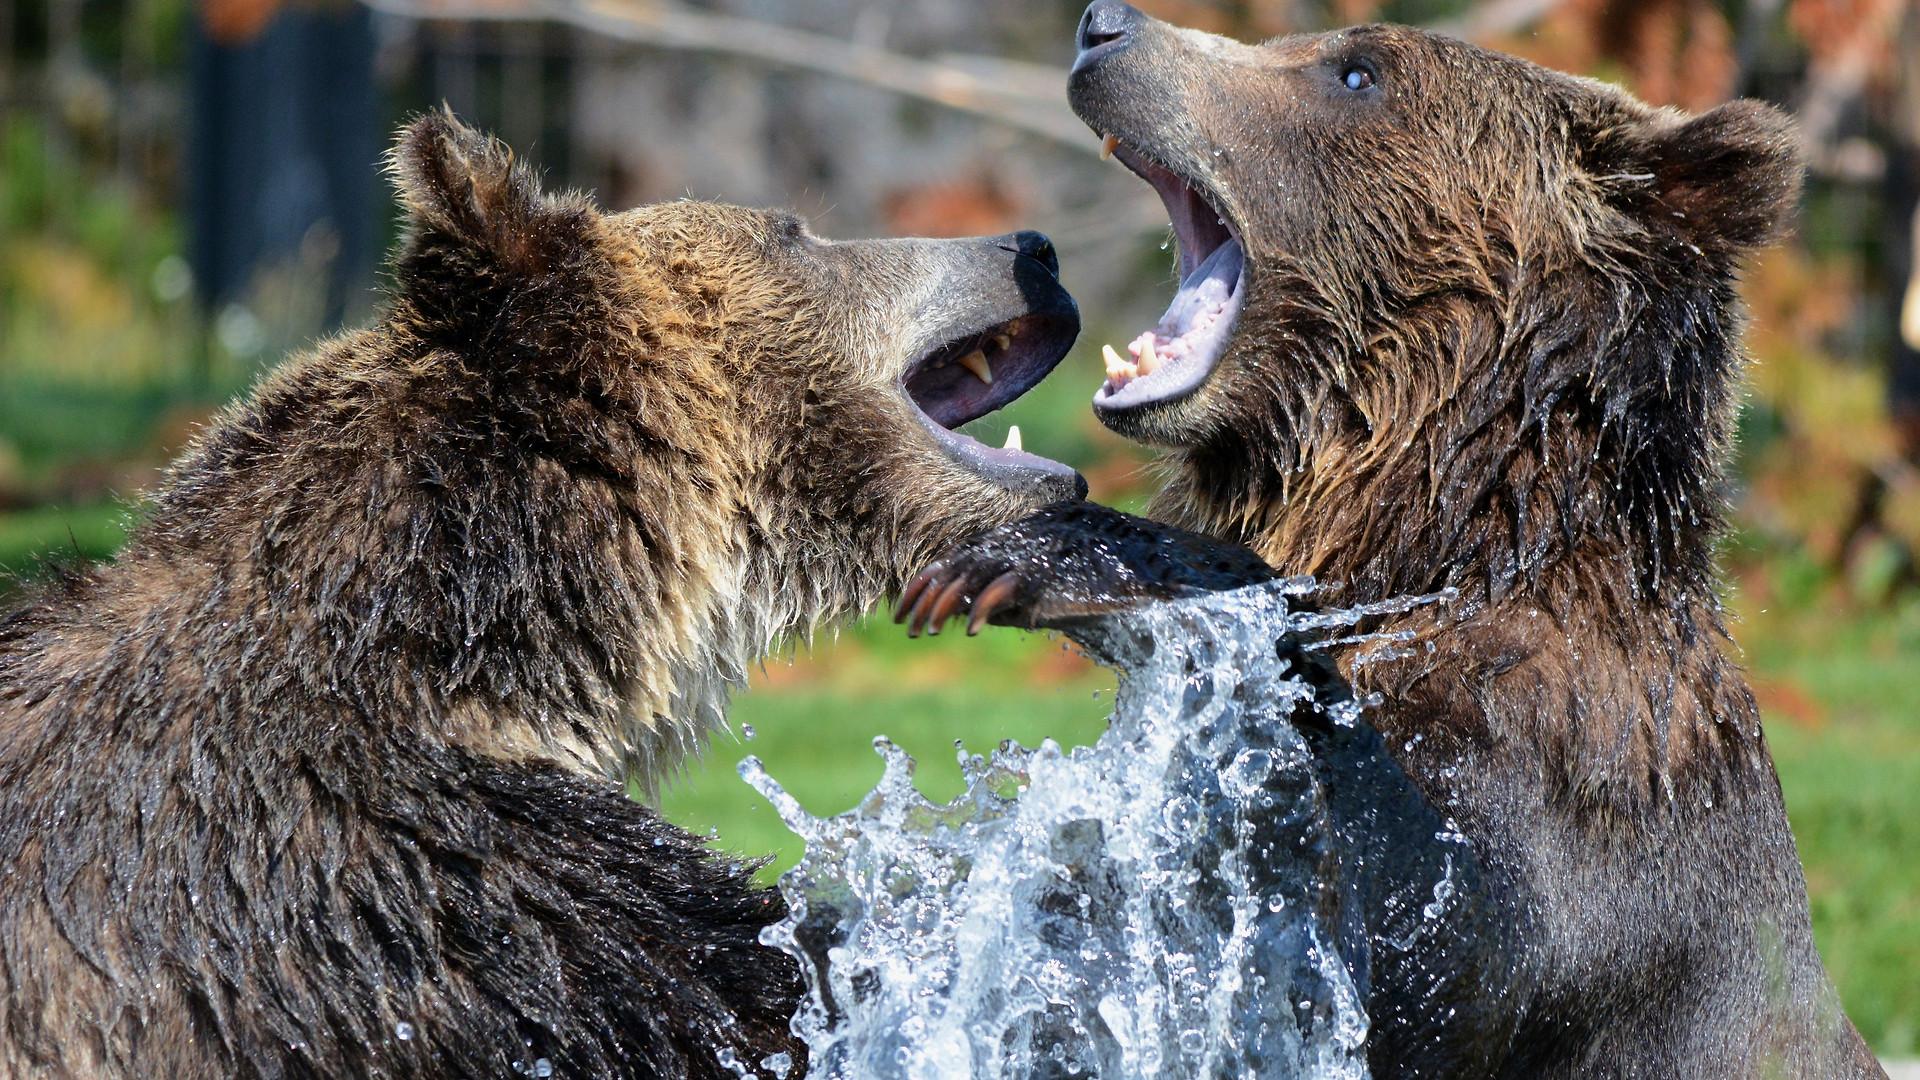 DuelingGrizzlyBears.jpg